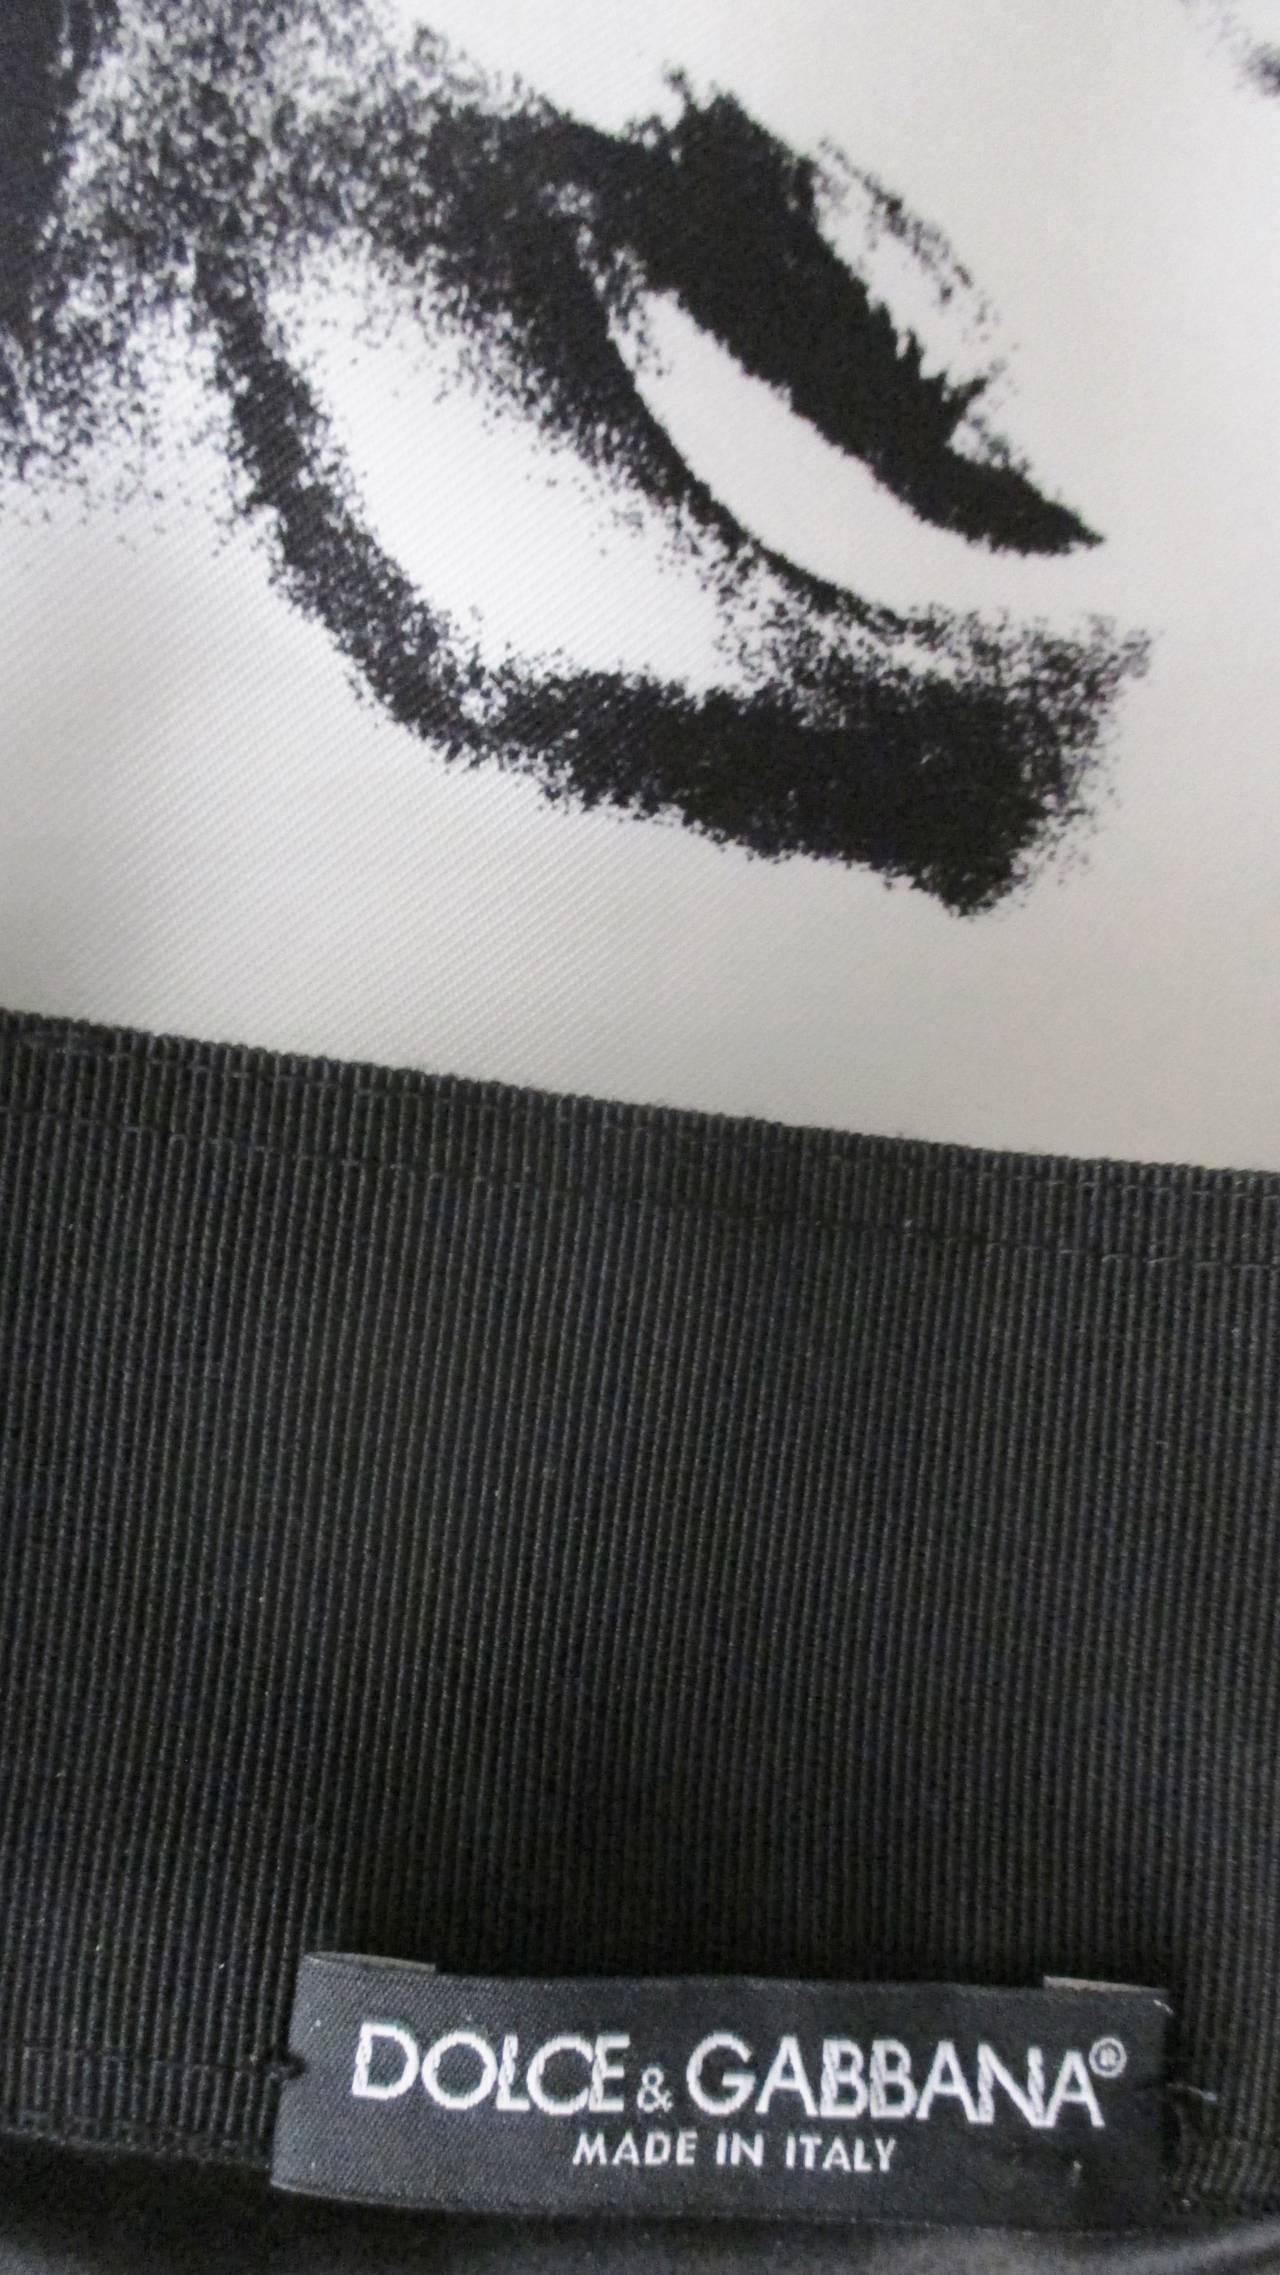 Iconic Marilyn Monroe Dolce & Gabbana Screen Print Skirt 10